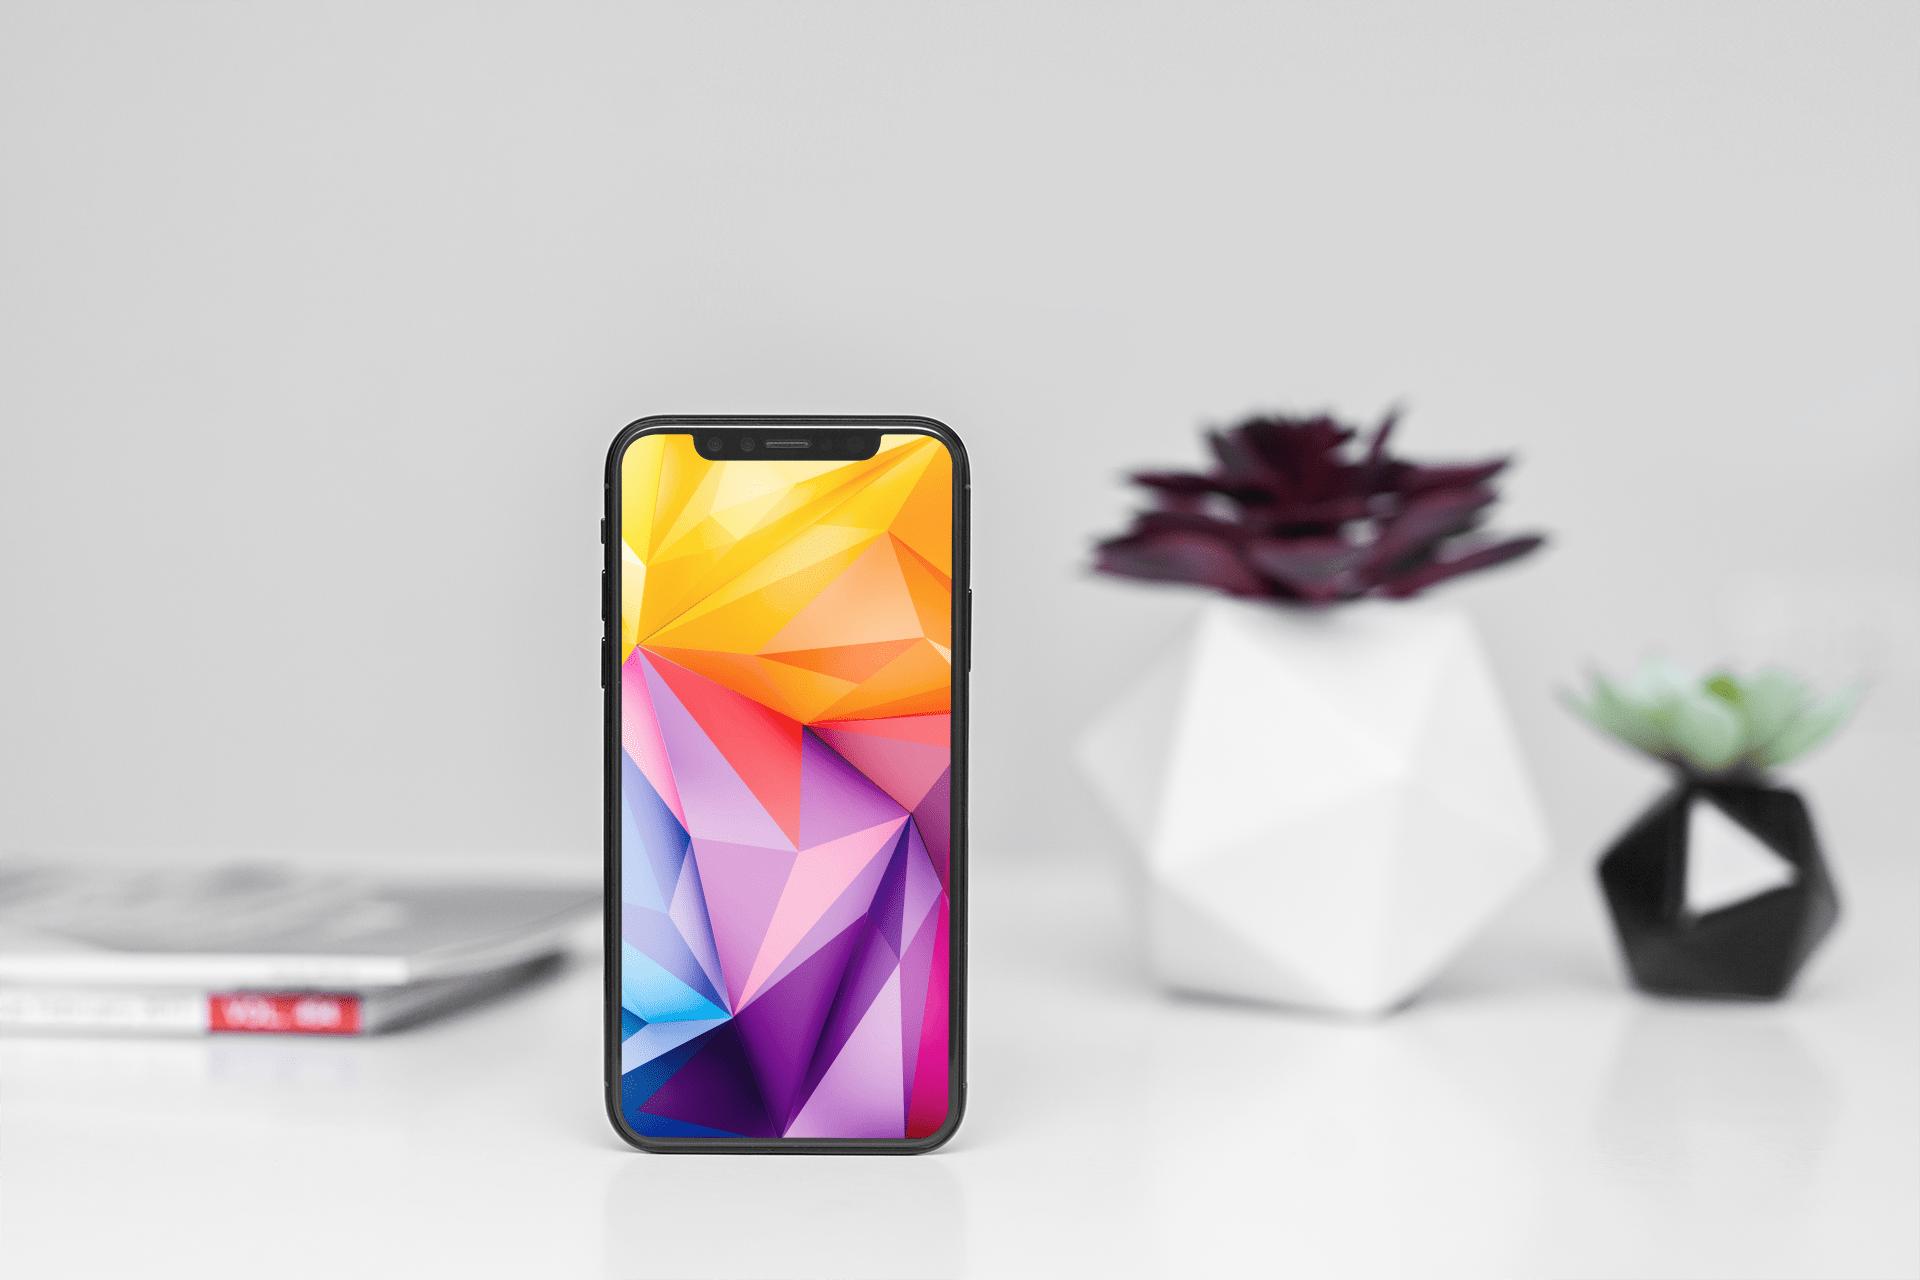 Abstract geometry wallpaper mockup image